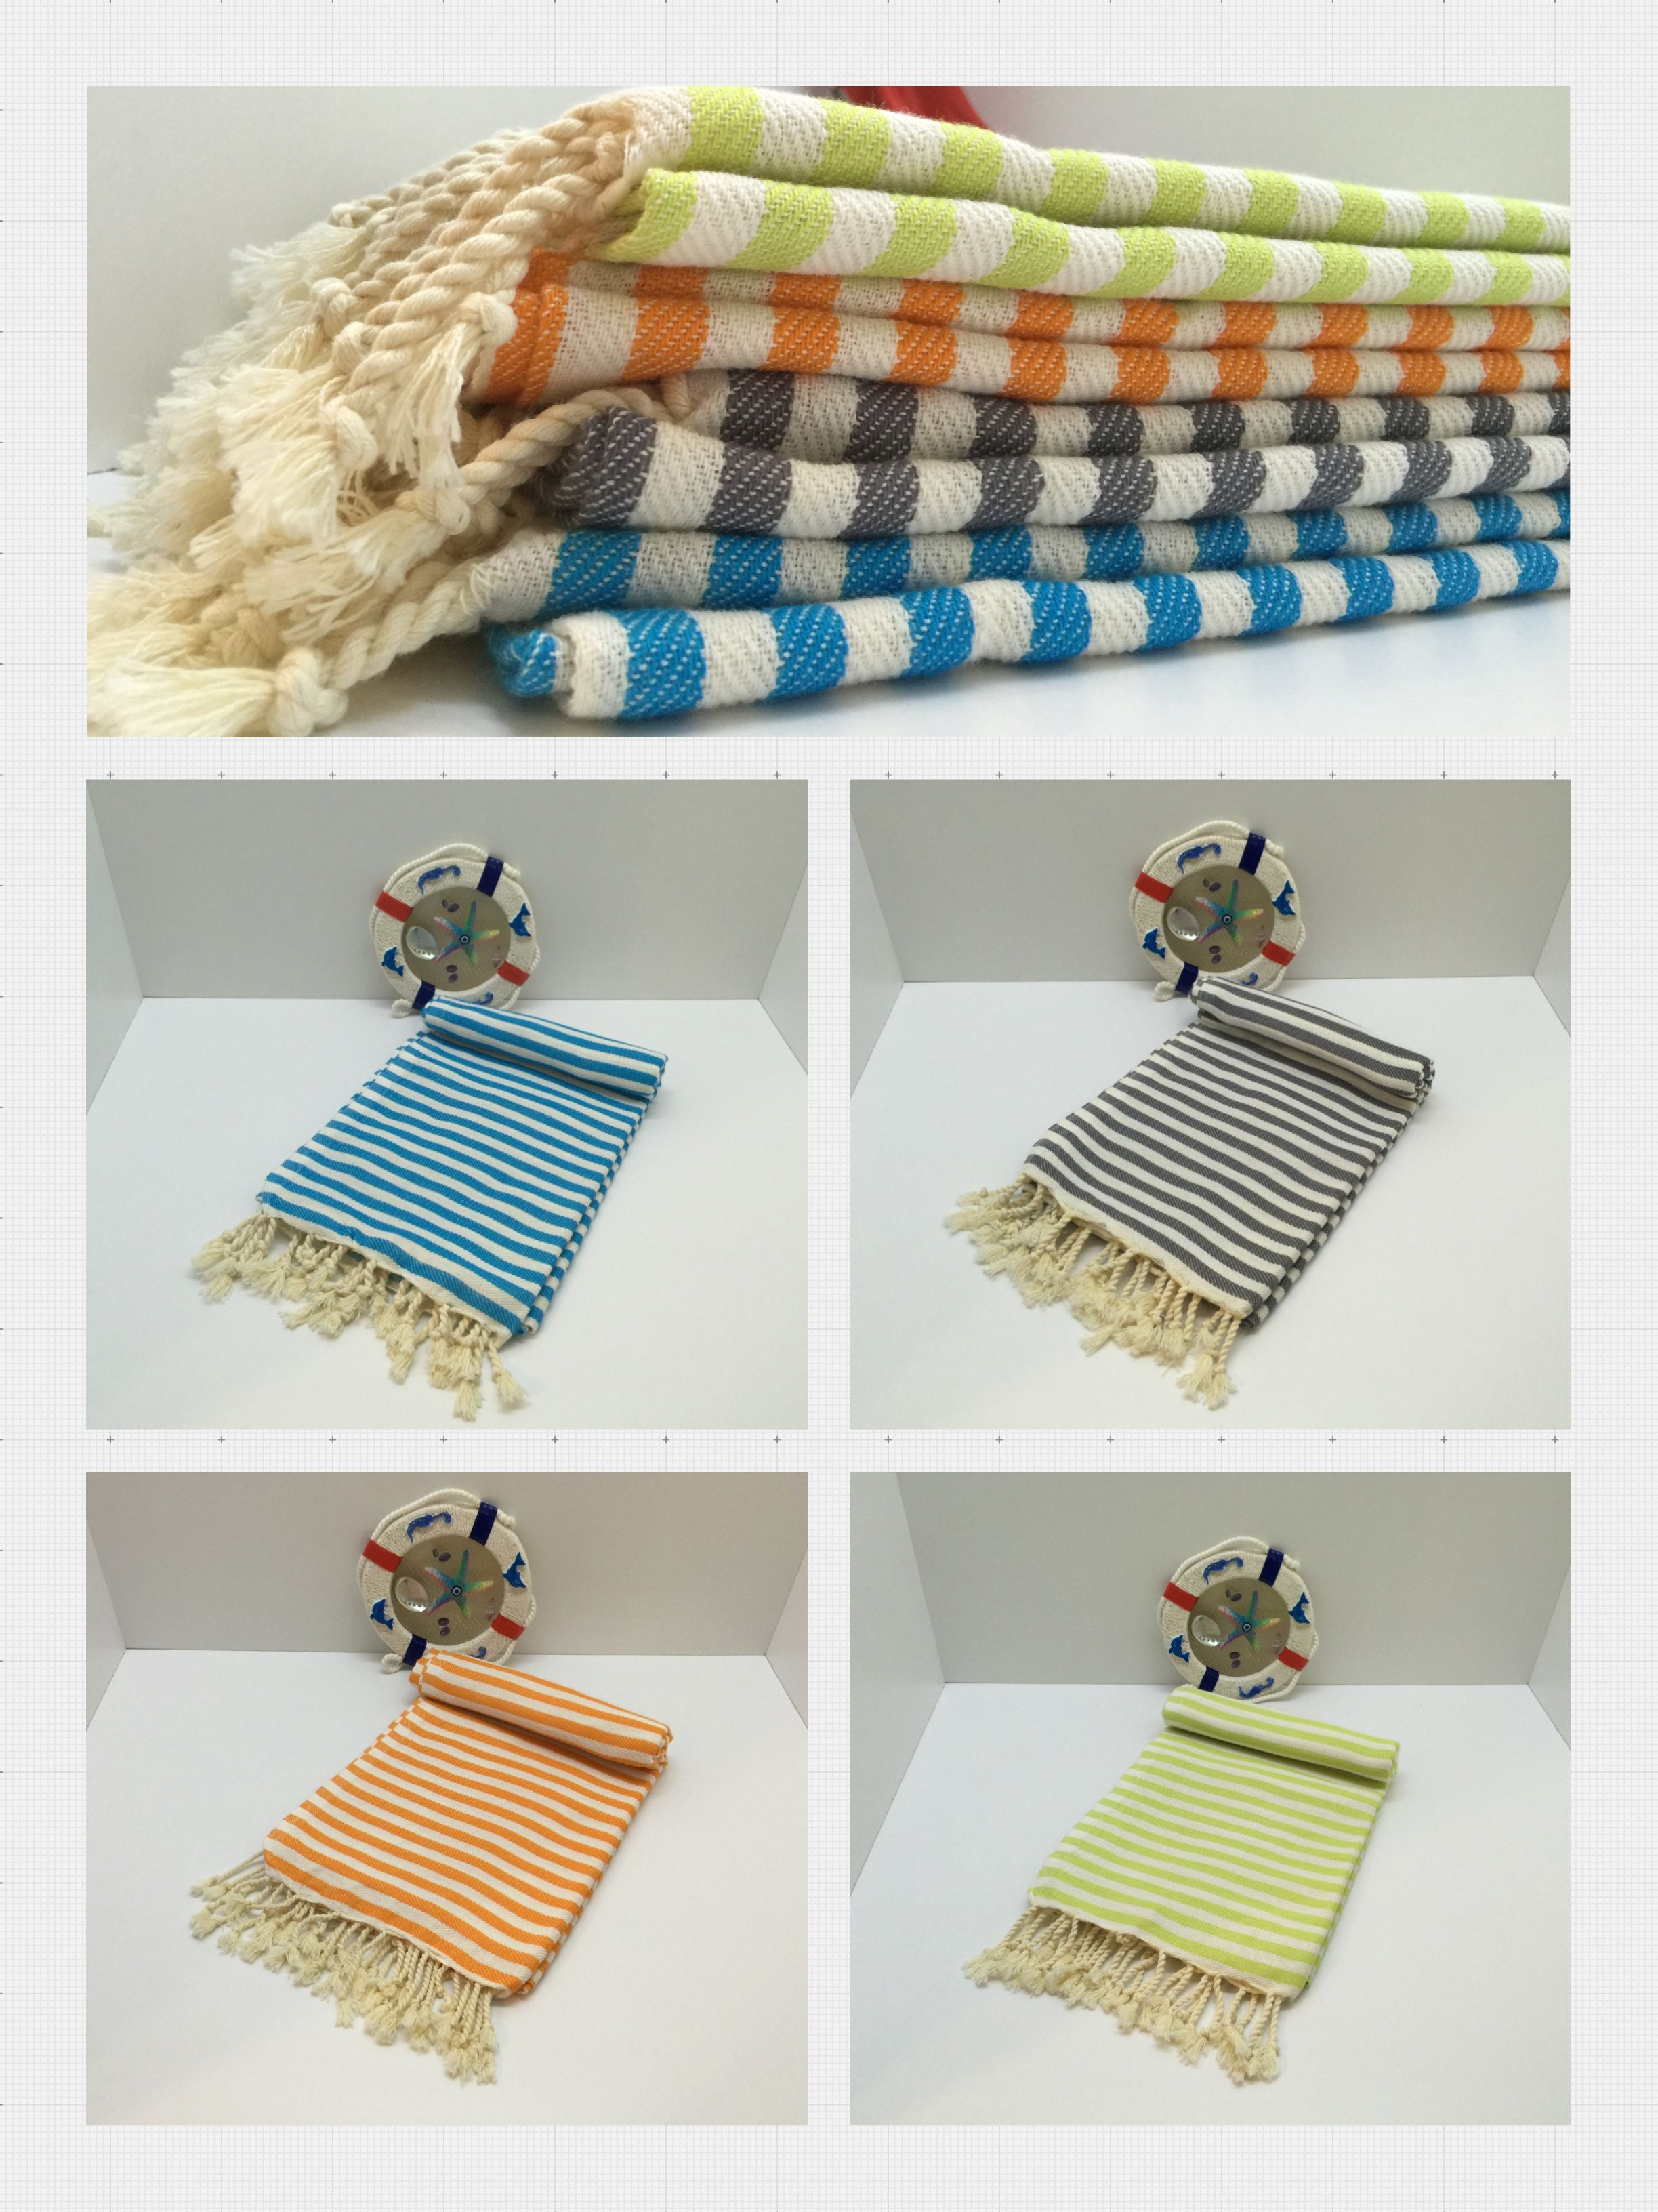 Bamboo Peshtemal Towels Striped 50 pcs Free Shipping to US | Towels ...